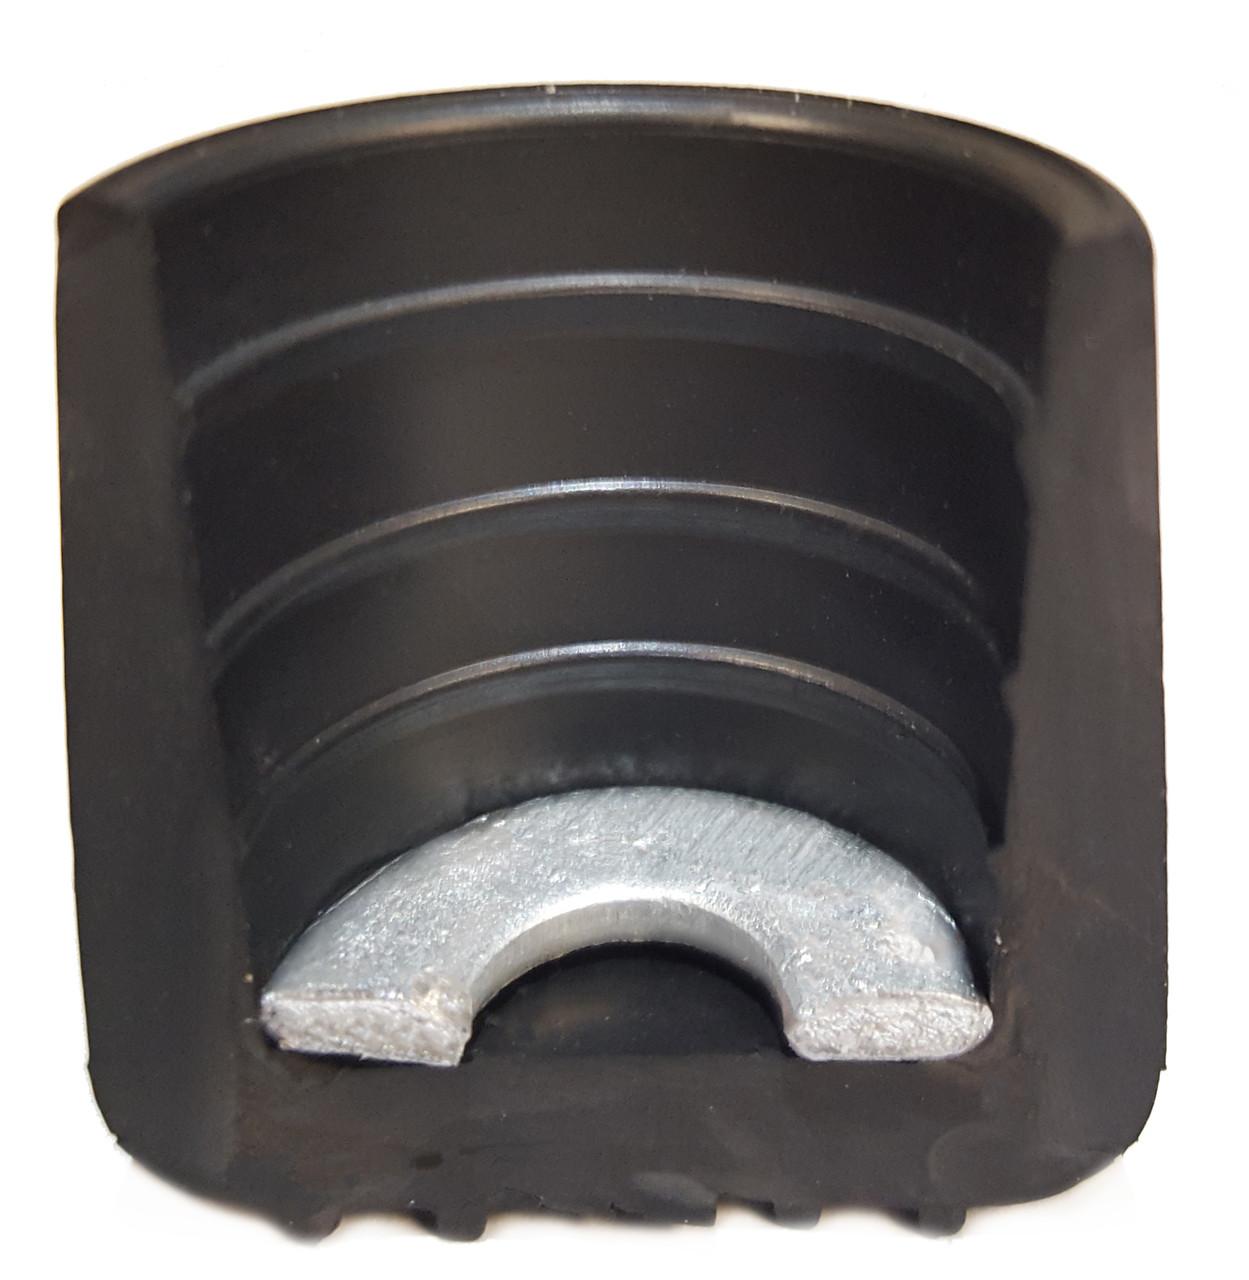 folding chair rubber feet aeron headrest review 100 pk non marring foot cap glides